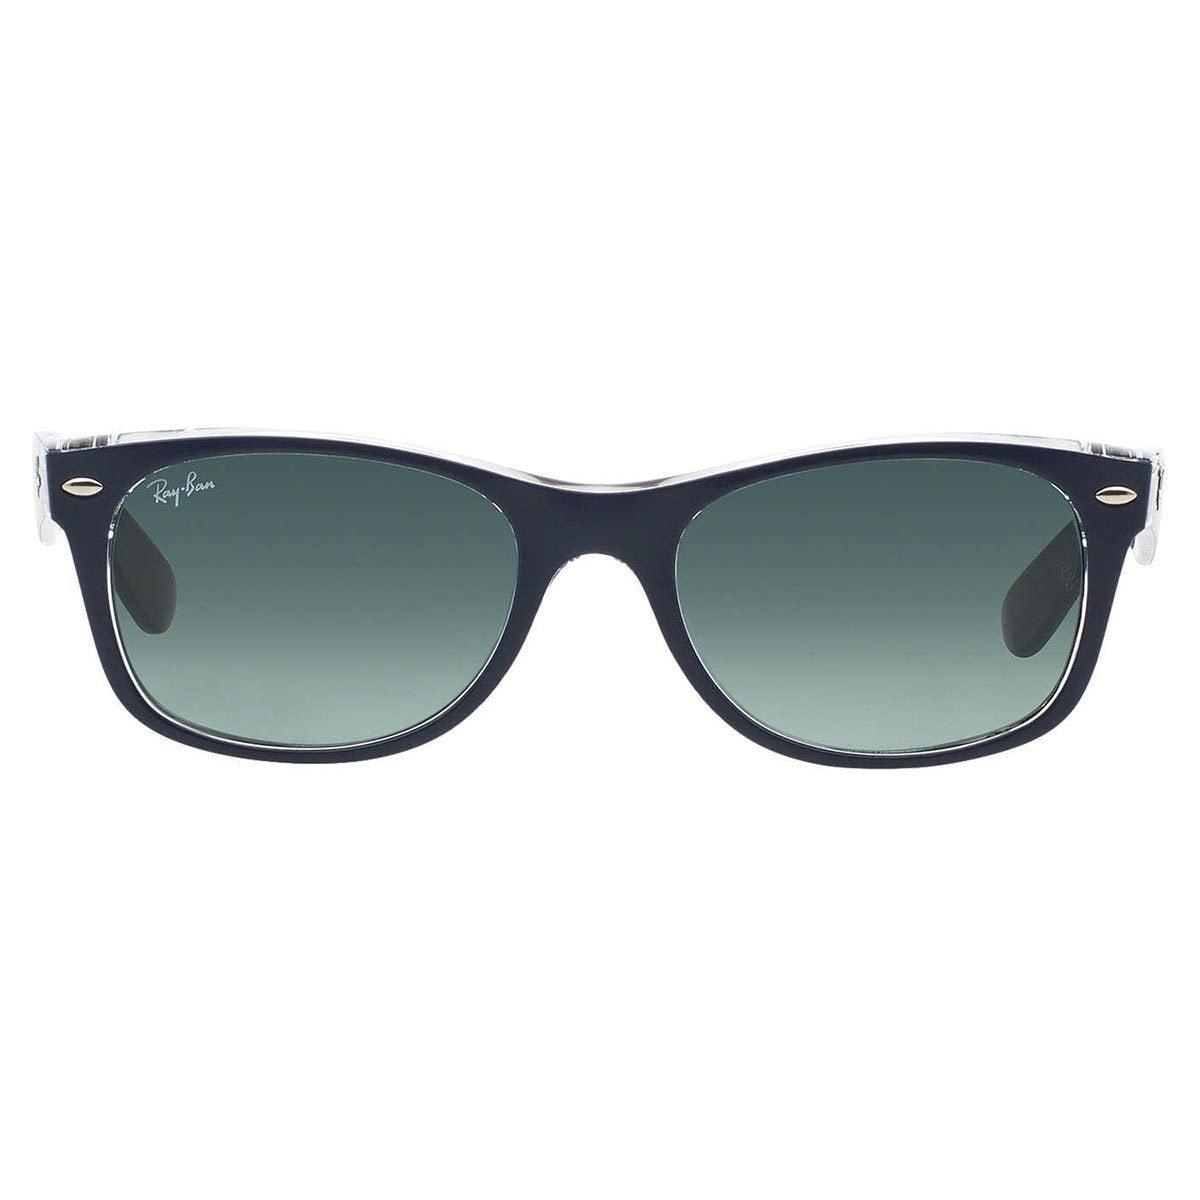 475228e76b Shop Ray-Ban Men s RB2132 Blue Plastic Square Sunglasses - Free Shipping  Today - Overstock.com - 10485408